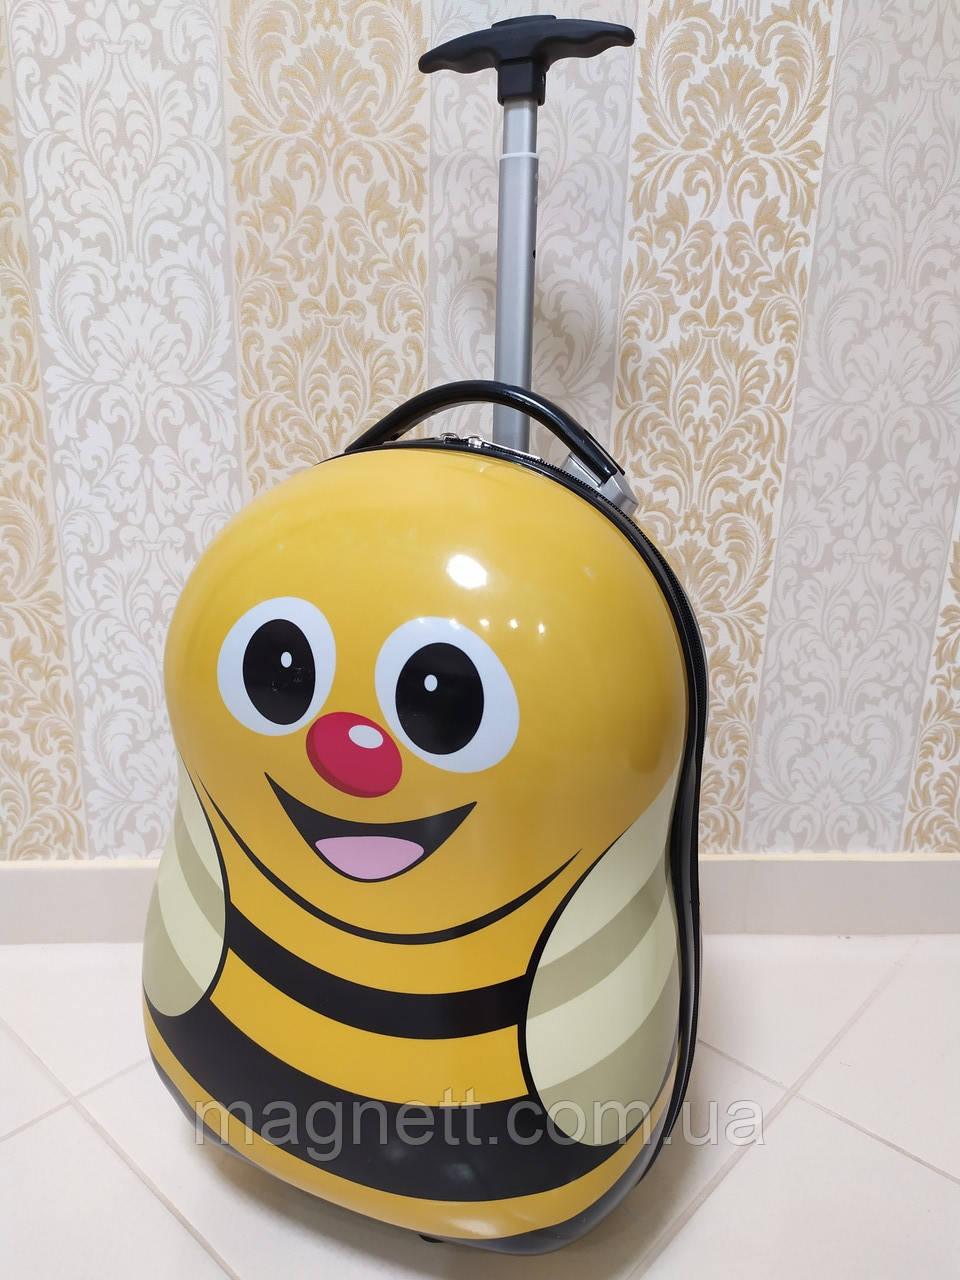 Детский чемодан на 2 колесах 45*30*25см Желтая Пчелка